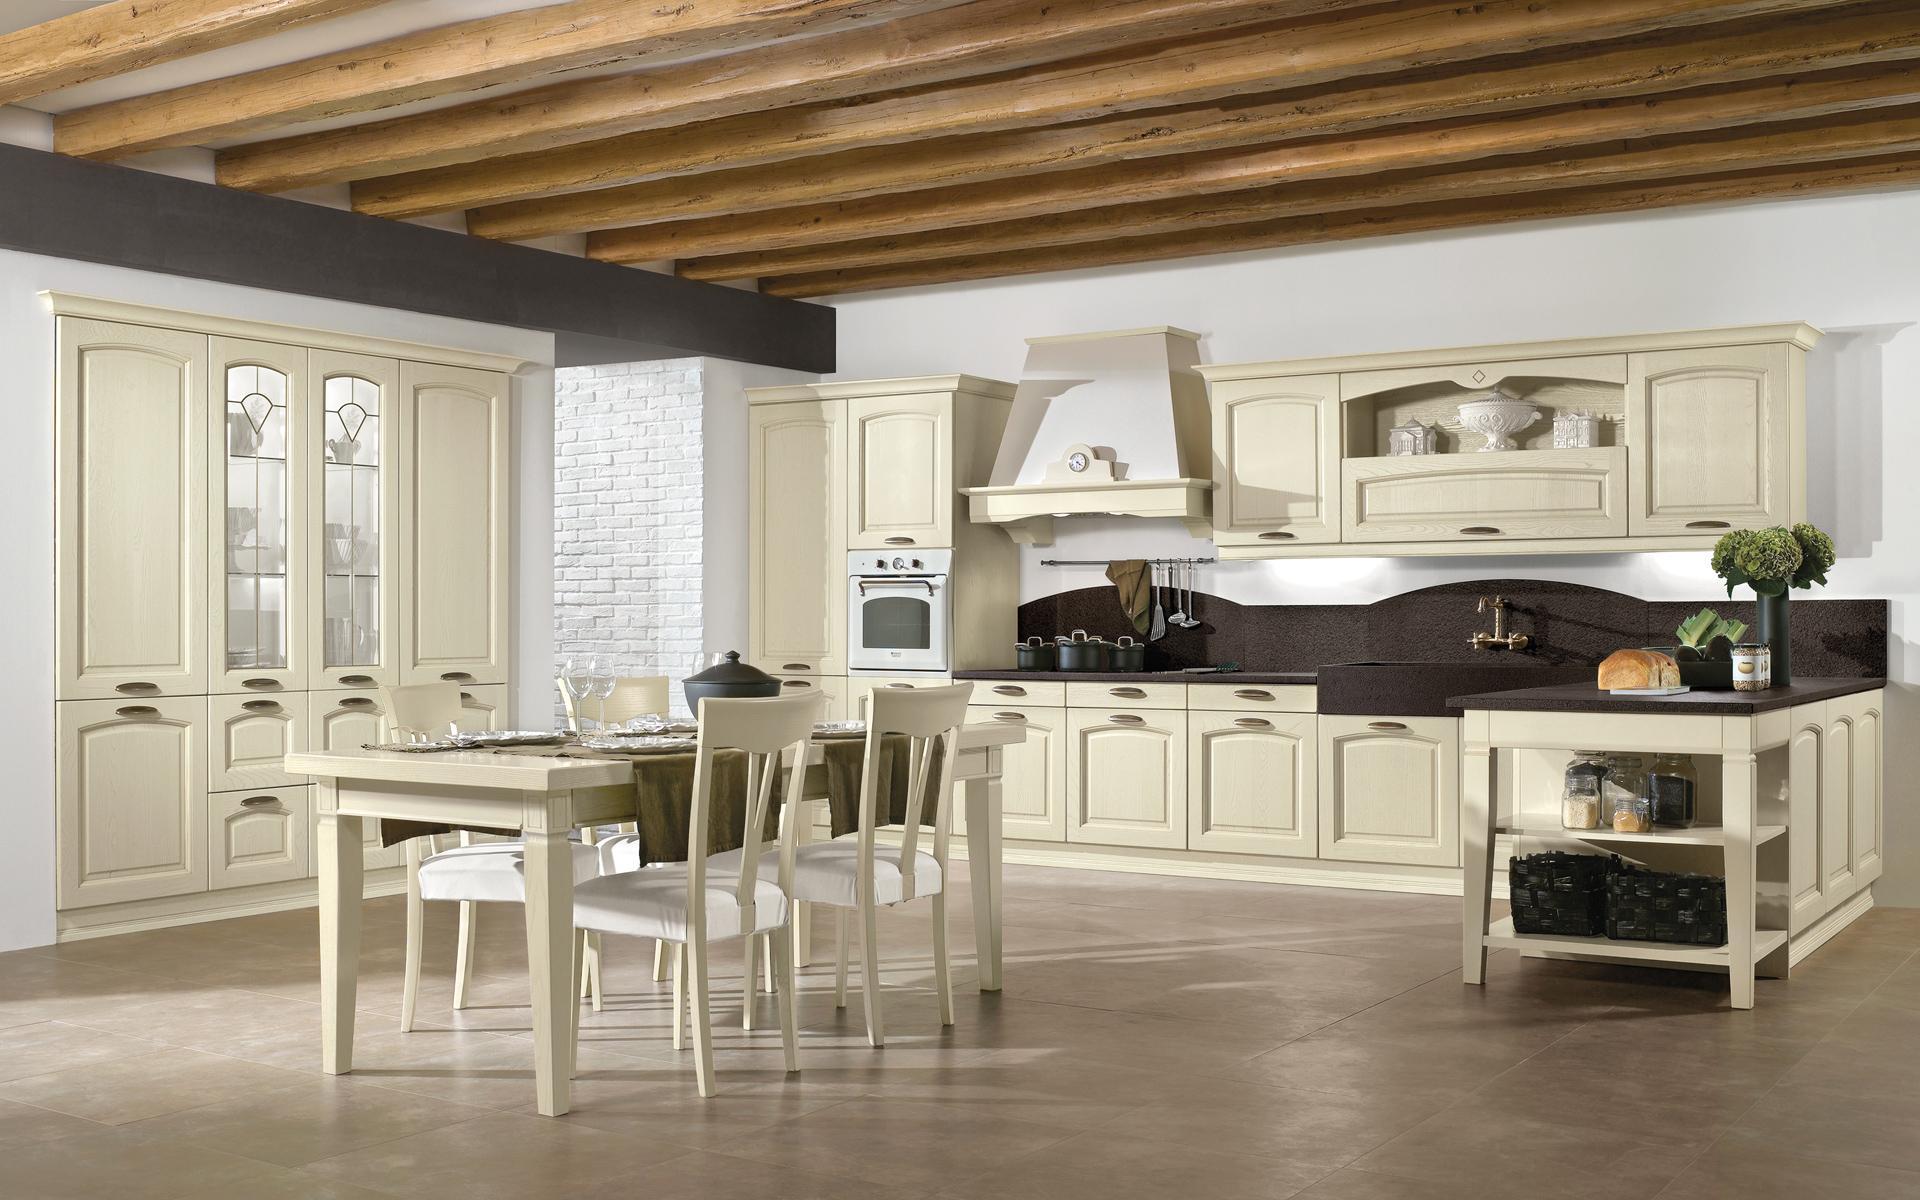 Cucine Classiche Moderne Prezzi: Cucine Scavolini. Cesar Cucine ...